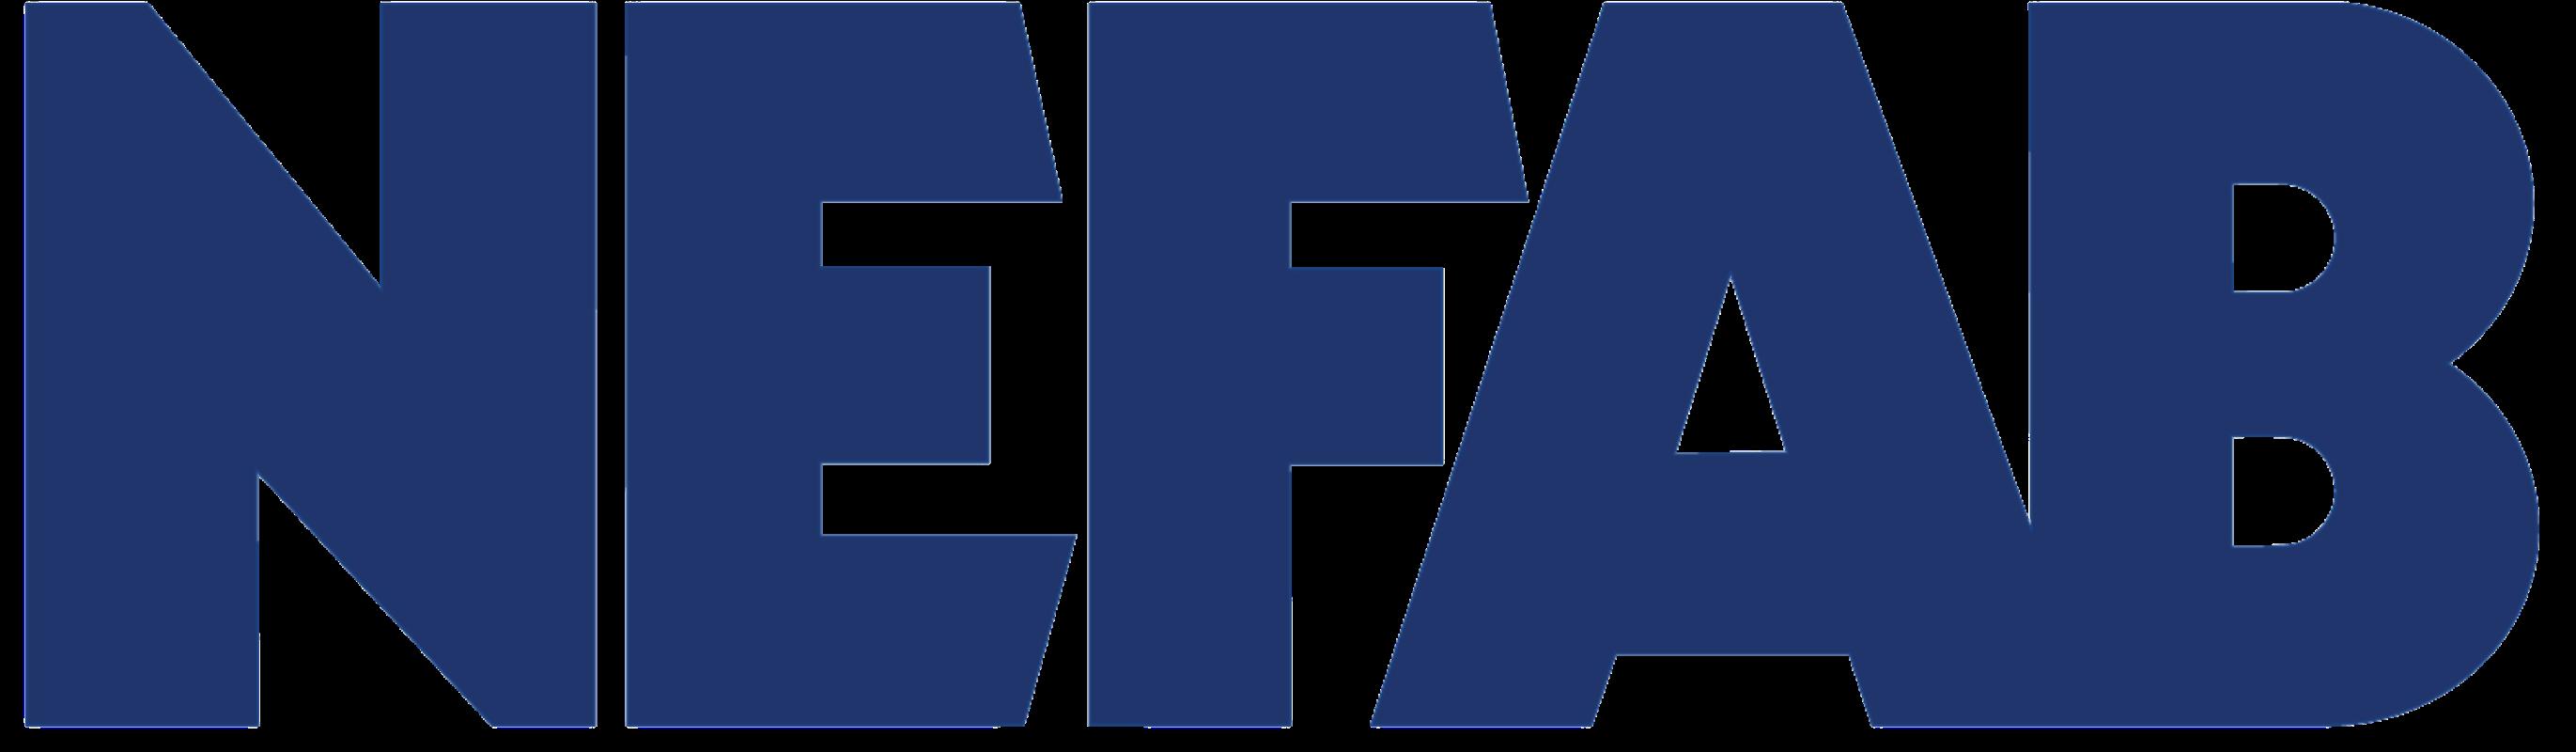 Nefab Packaging Netherlands logo